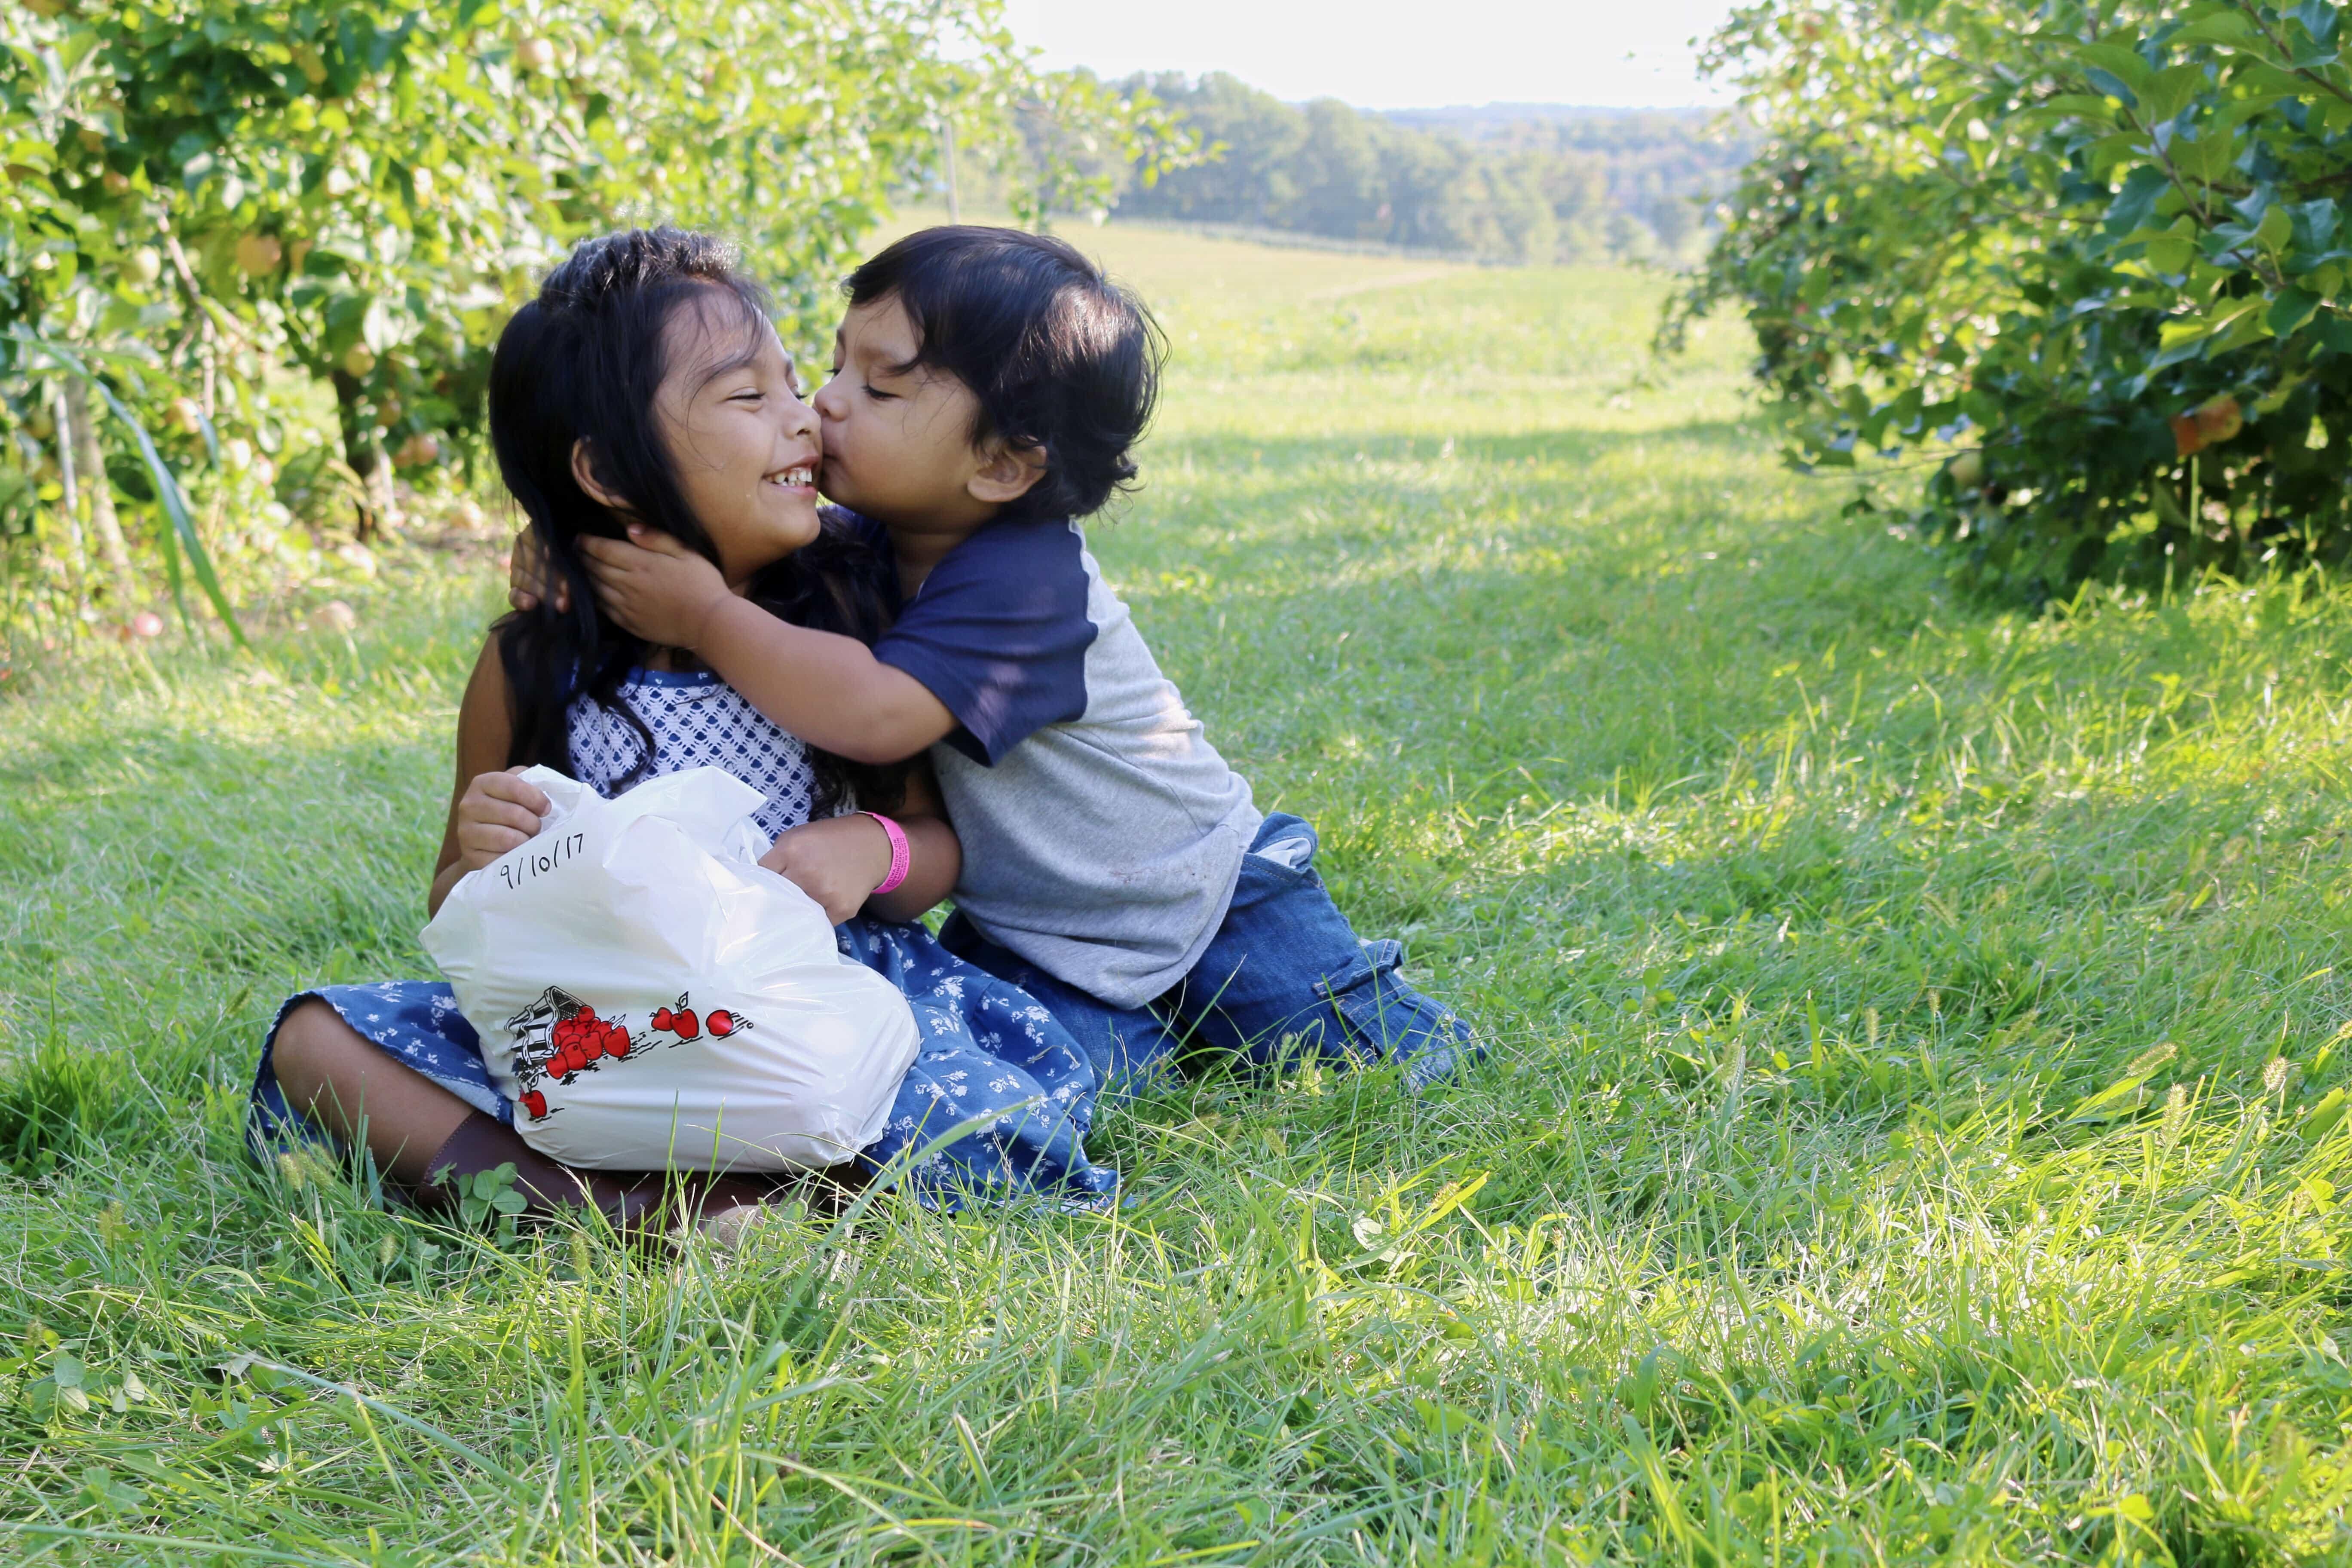 Gaver-Farm-Apple=Harvest-Fall-Festivals-Recogiendo-Manzanas